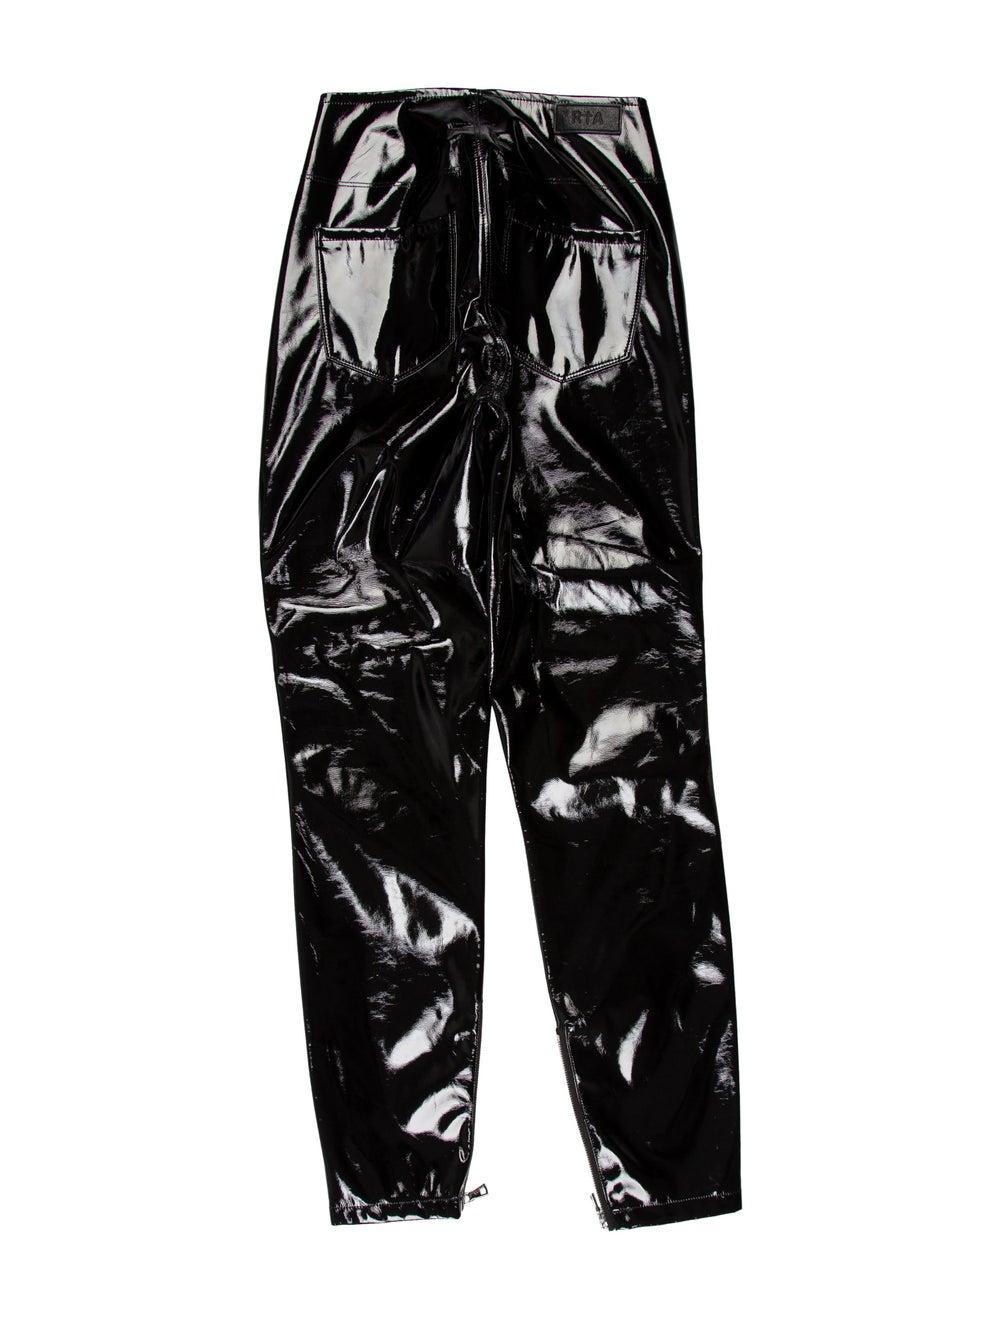 RtA Denim Mid-Rise Vinyl Pants Black - image 2